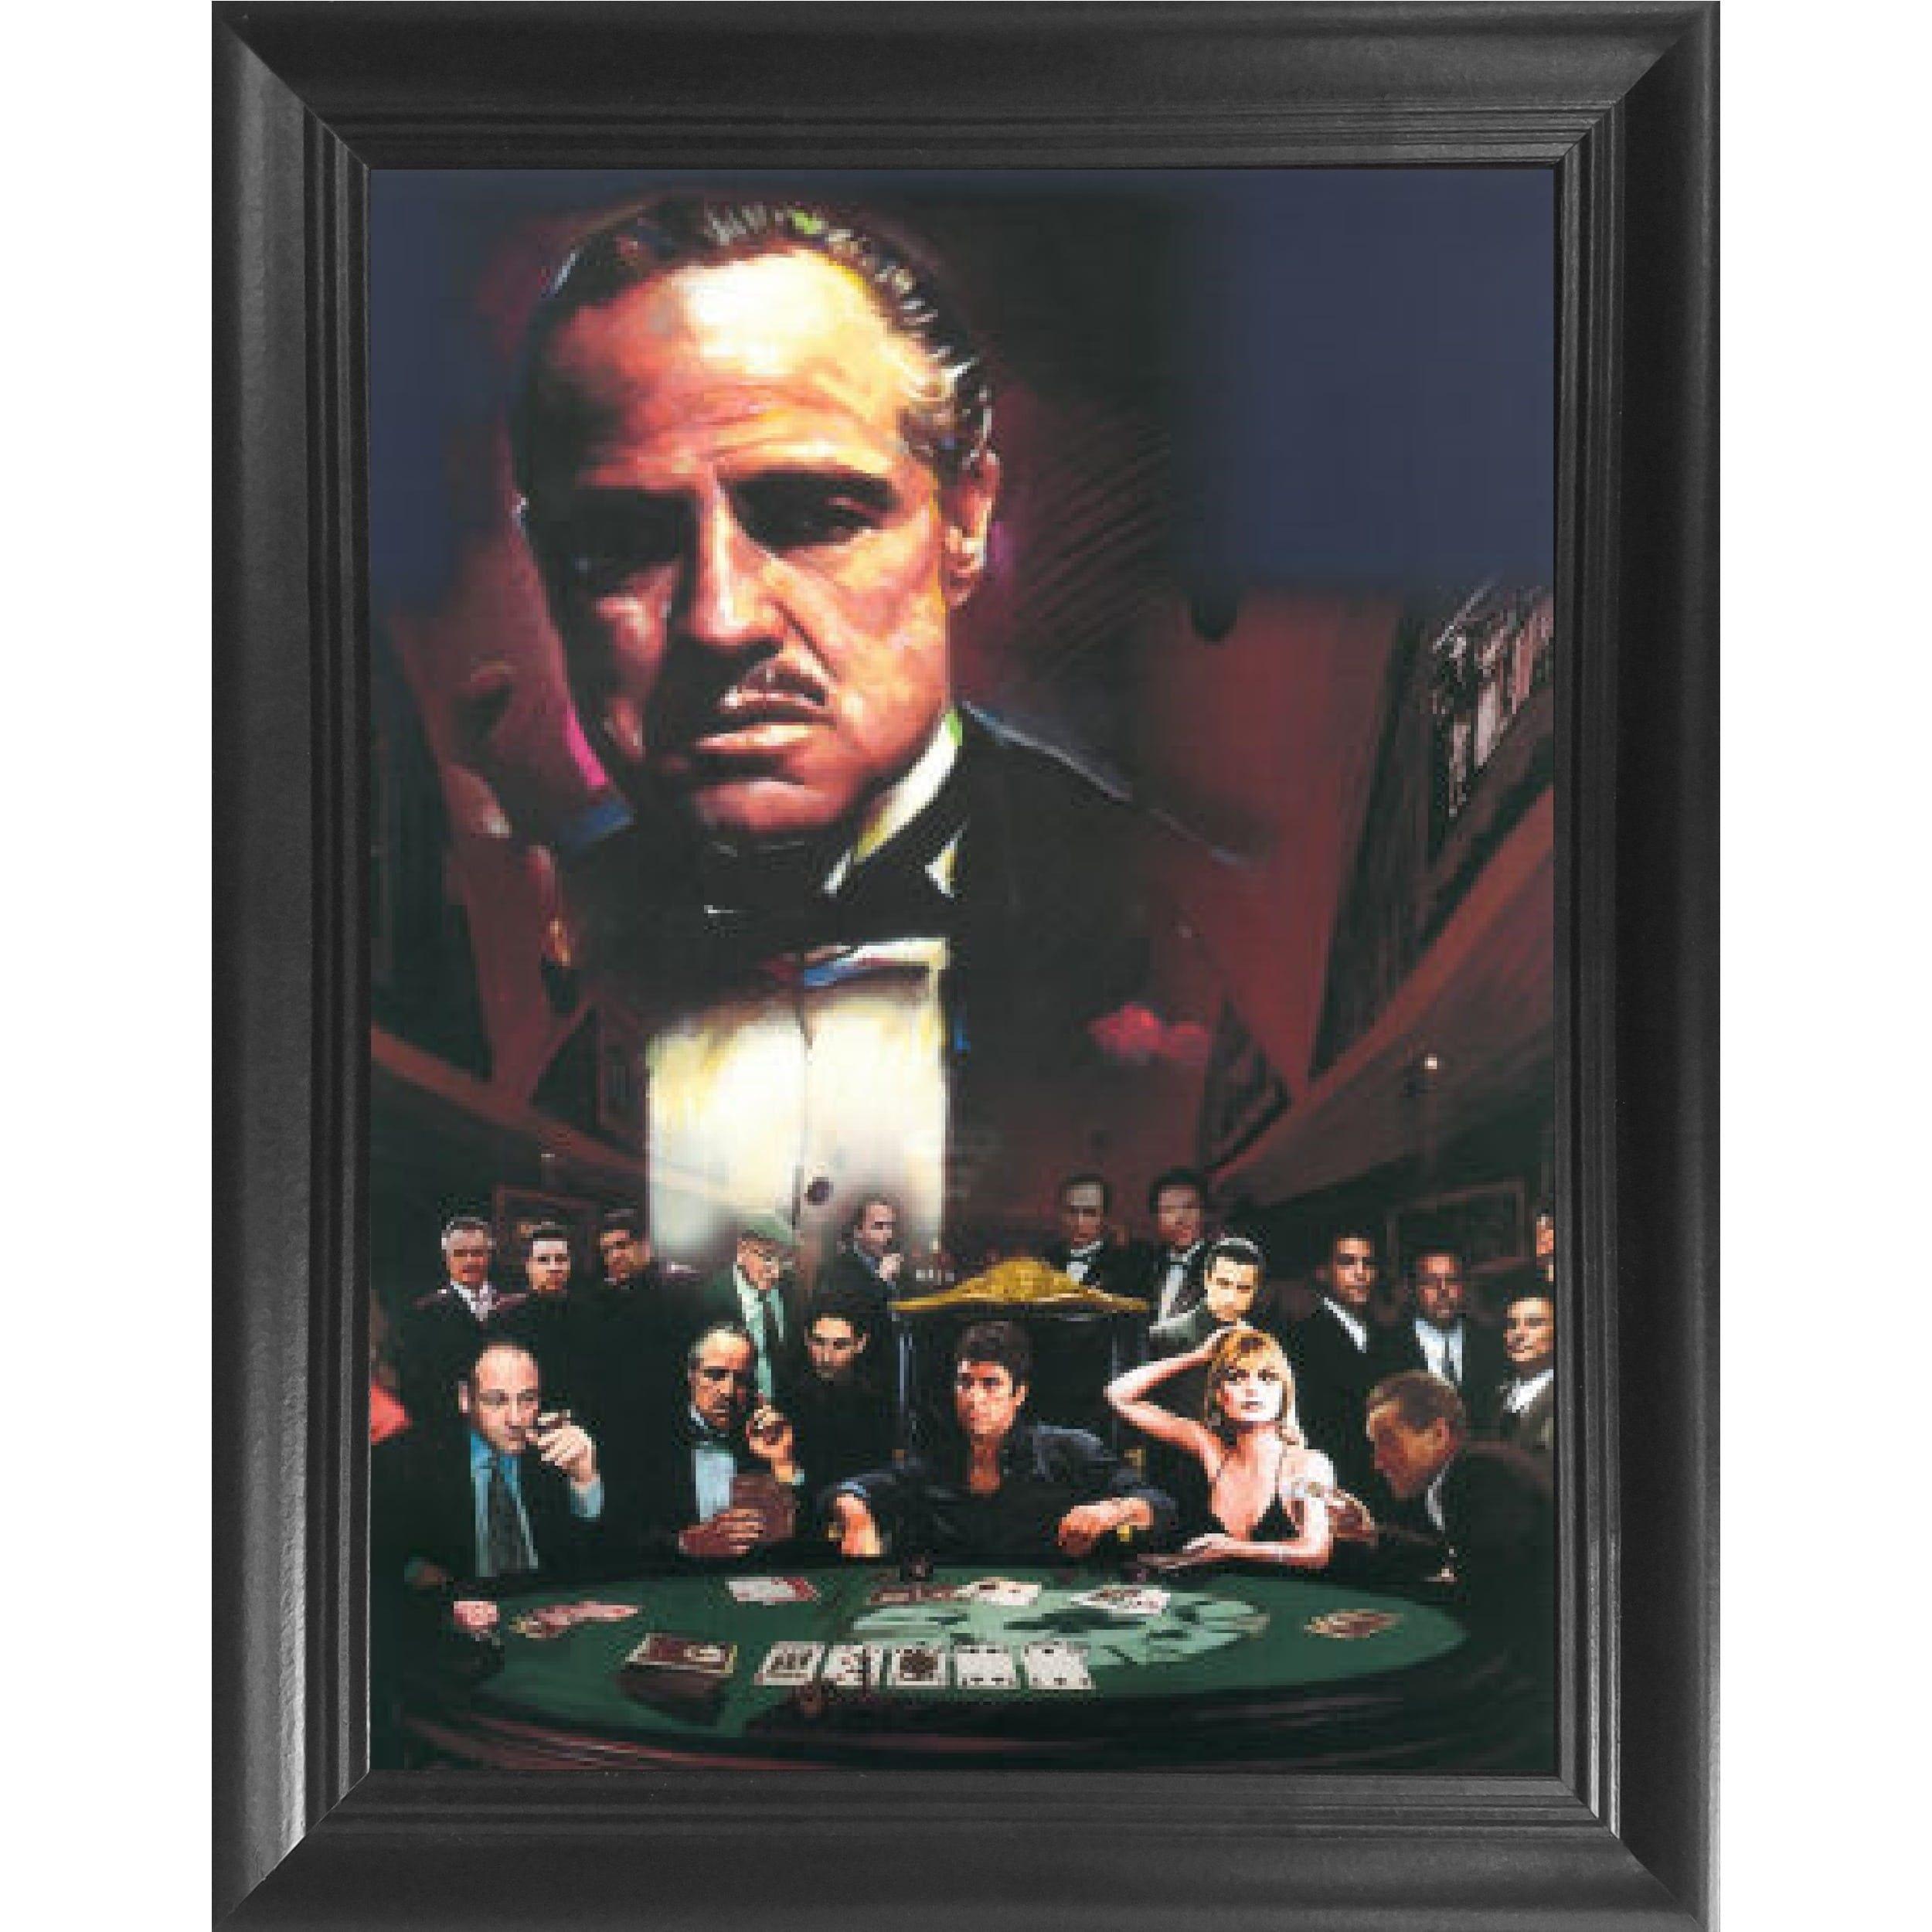 Goodfellas Movie Poster Print Wall Art Gift Frame Present